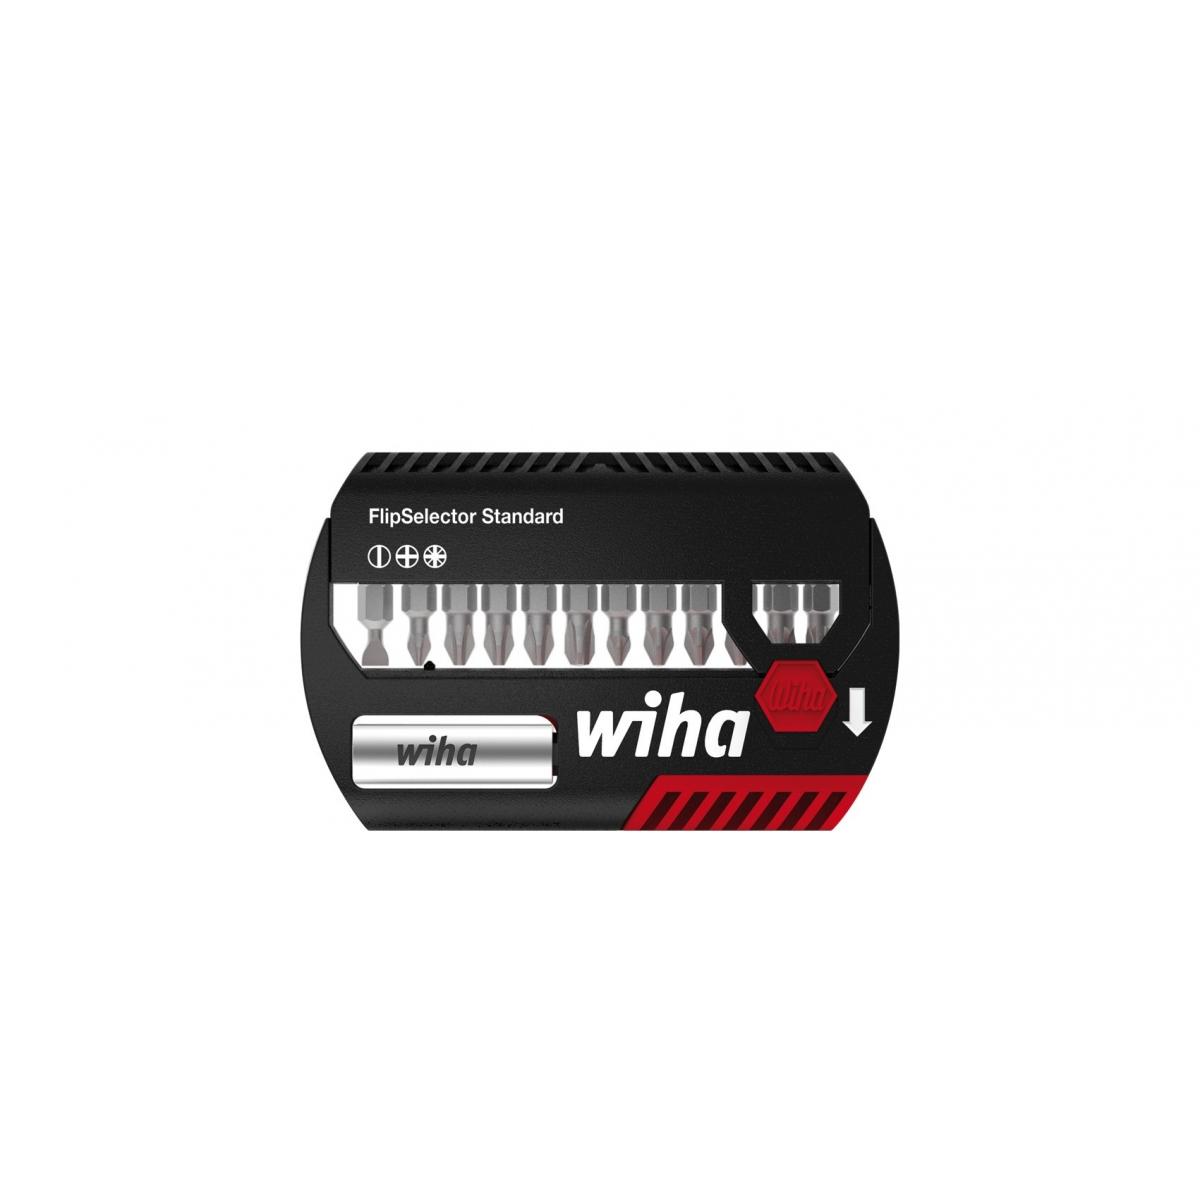 Zestaw bitów FlipSelector Standard 25 mm Wiha - 39049 Zestaw bitów FlipSelector Standard 25 mm Wiha - 39049